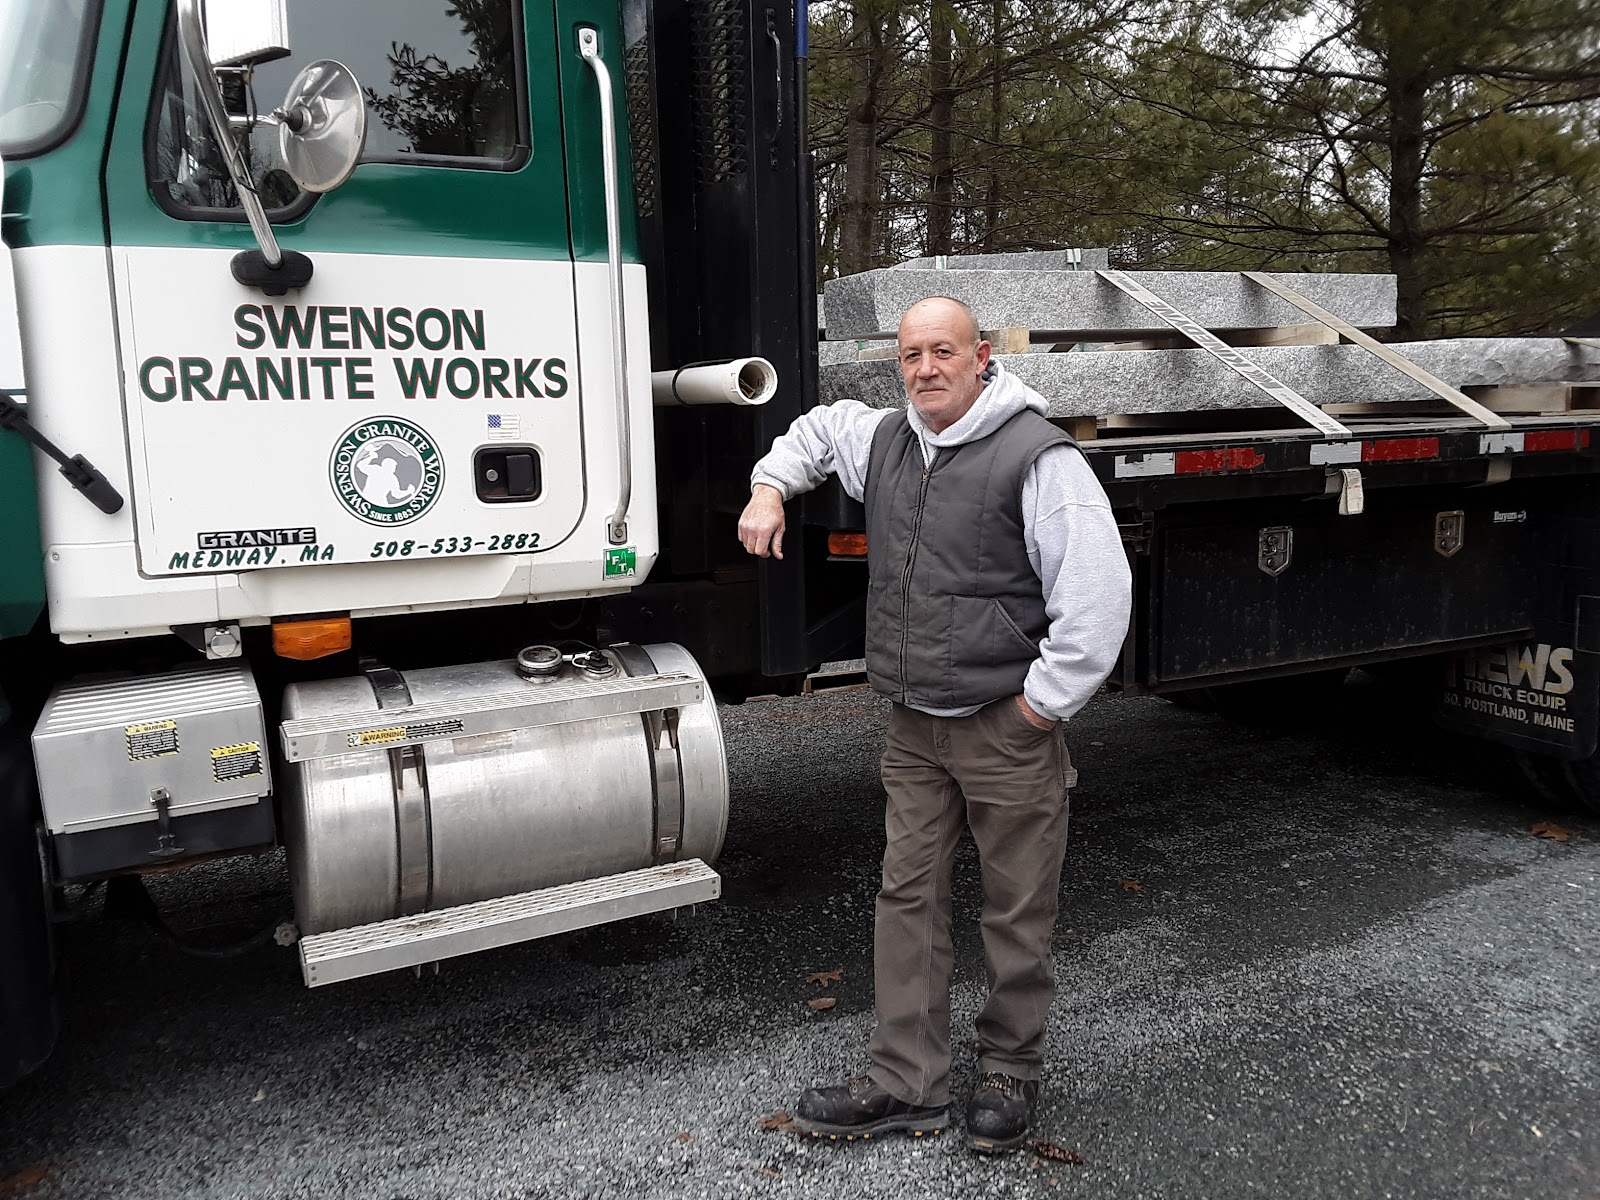 Dan Courtney, Swenson Granite Works Medway Store Truck Driver